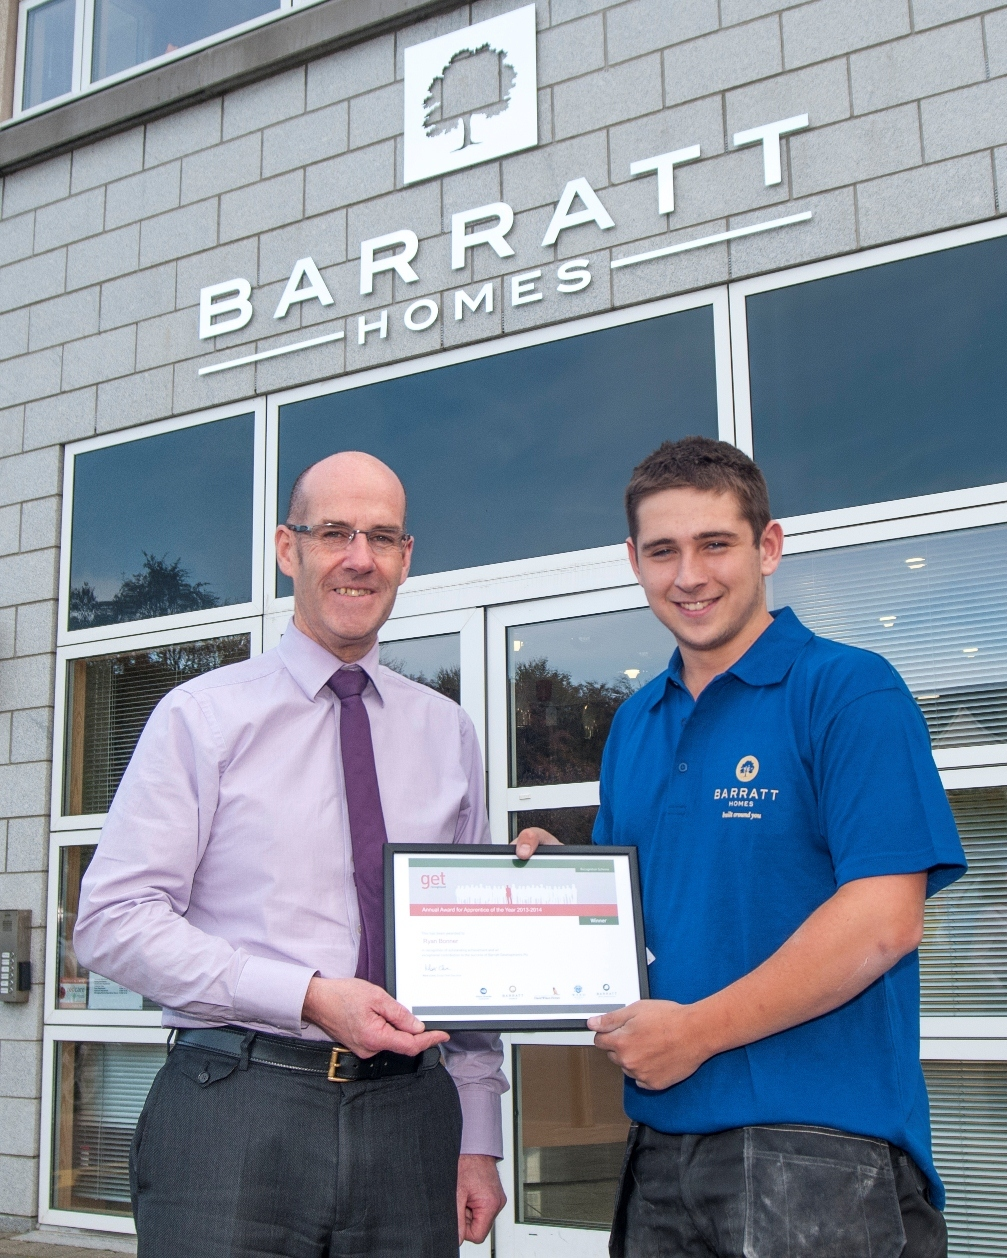 David Stewart with Apprentice of the Year Ryan Bonner